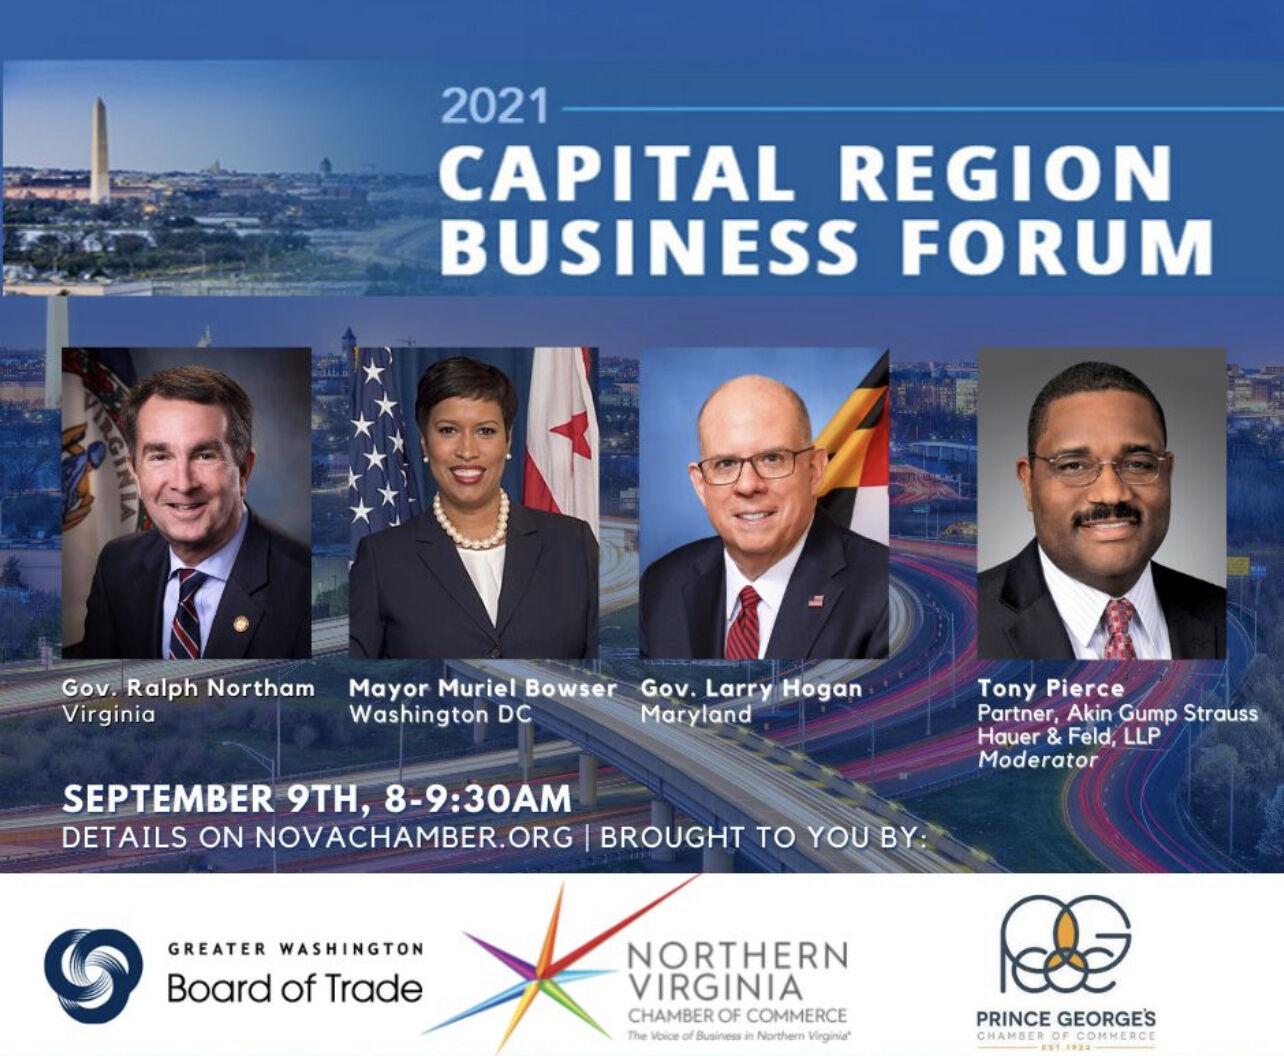 2021 Capital Region Business Forum - Northern Virgina Chamber of Commerce